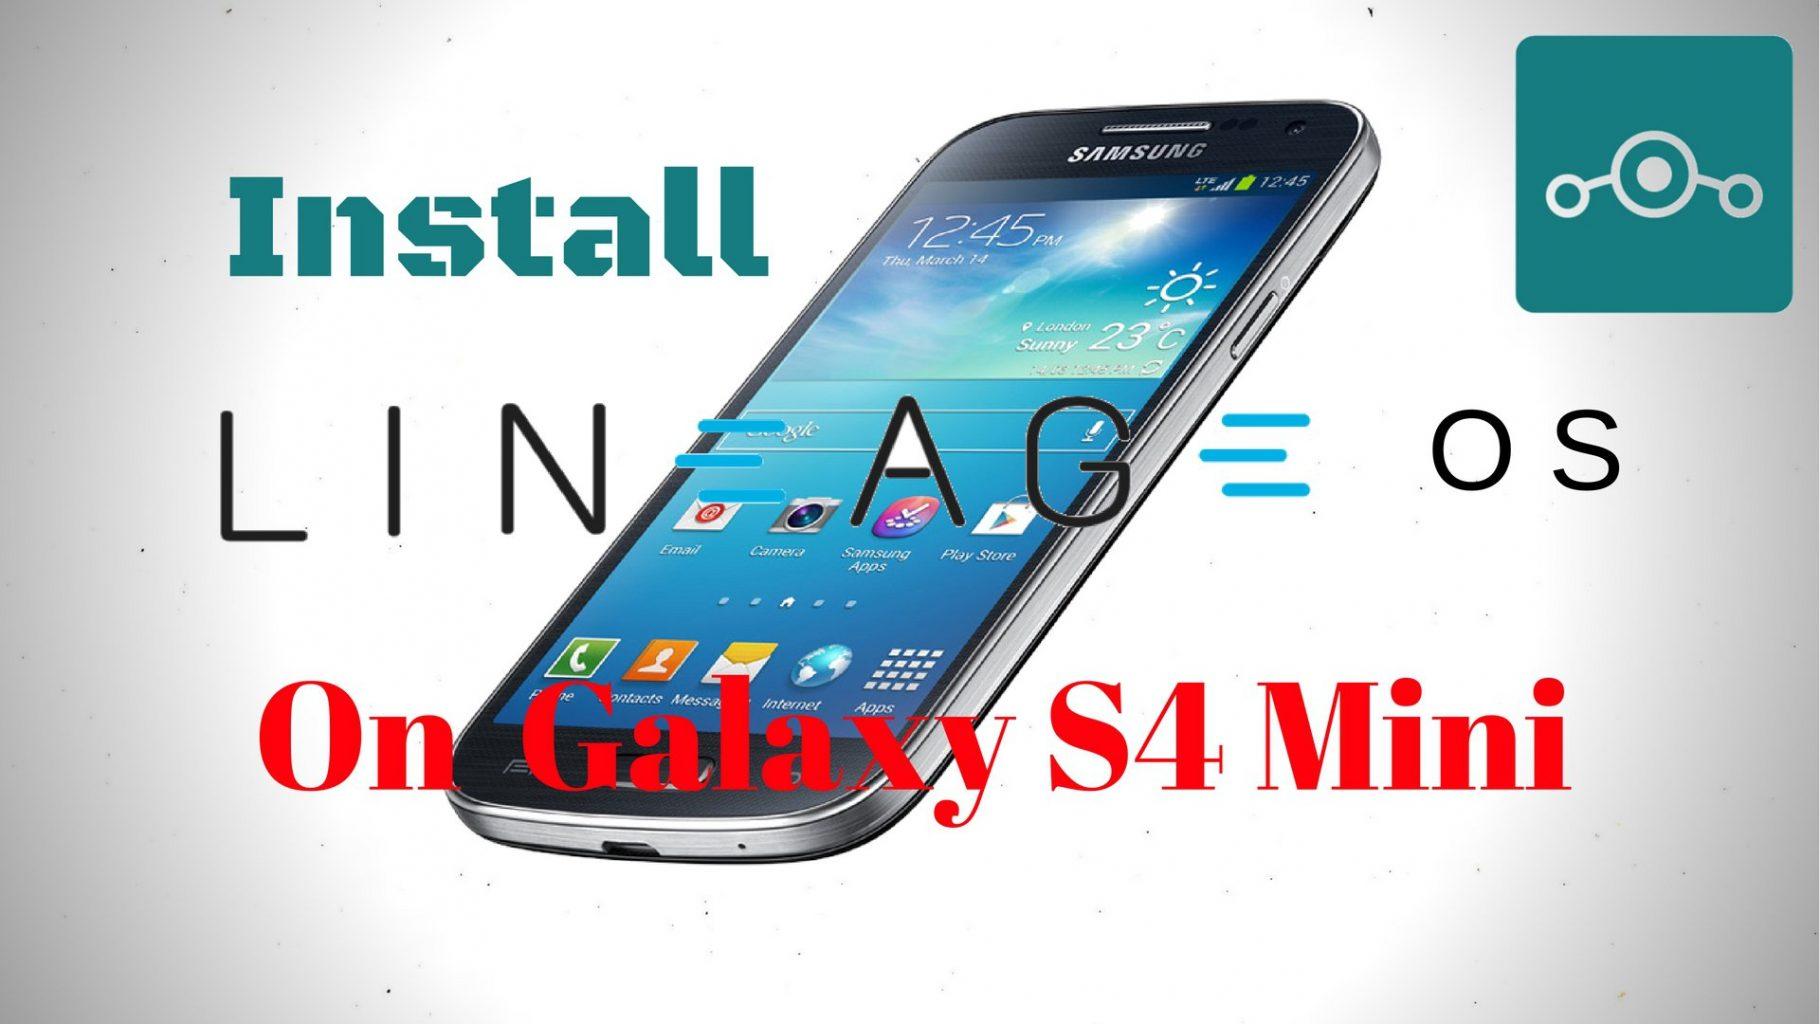 Install Lineage OS 14 1 On Samsung Galaxy S4 Mini - Hacks